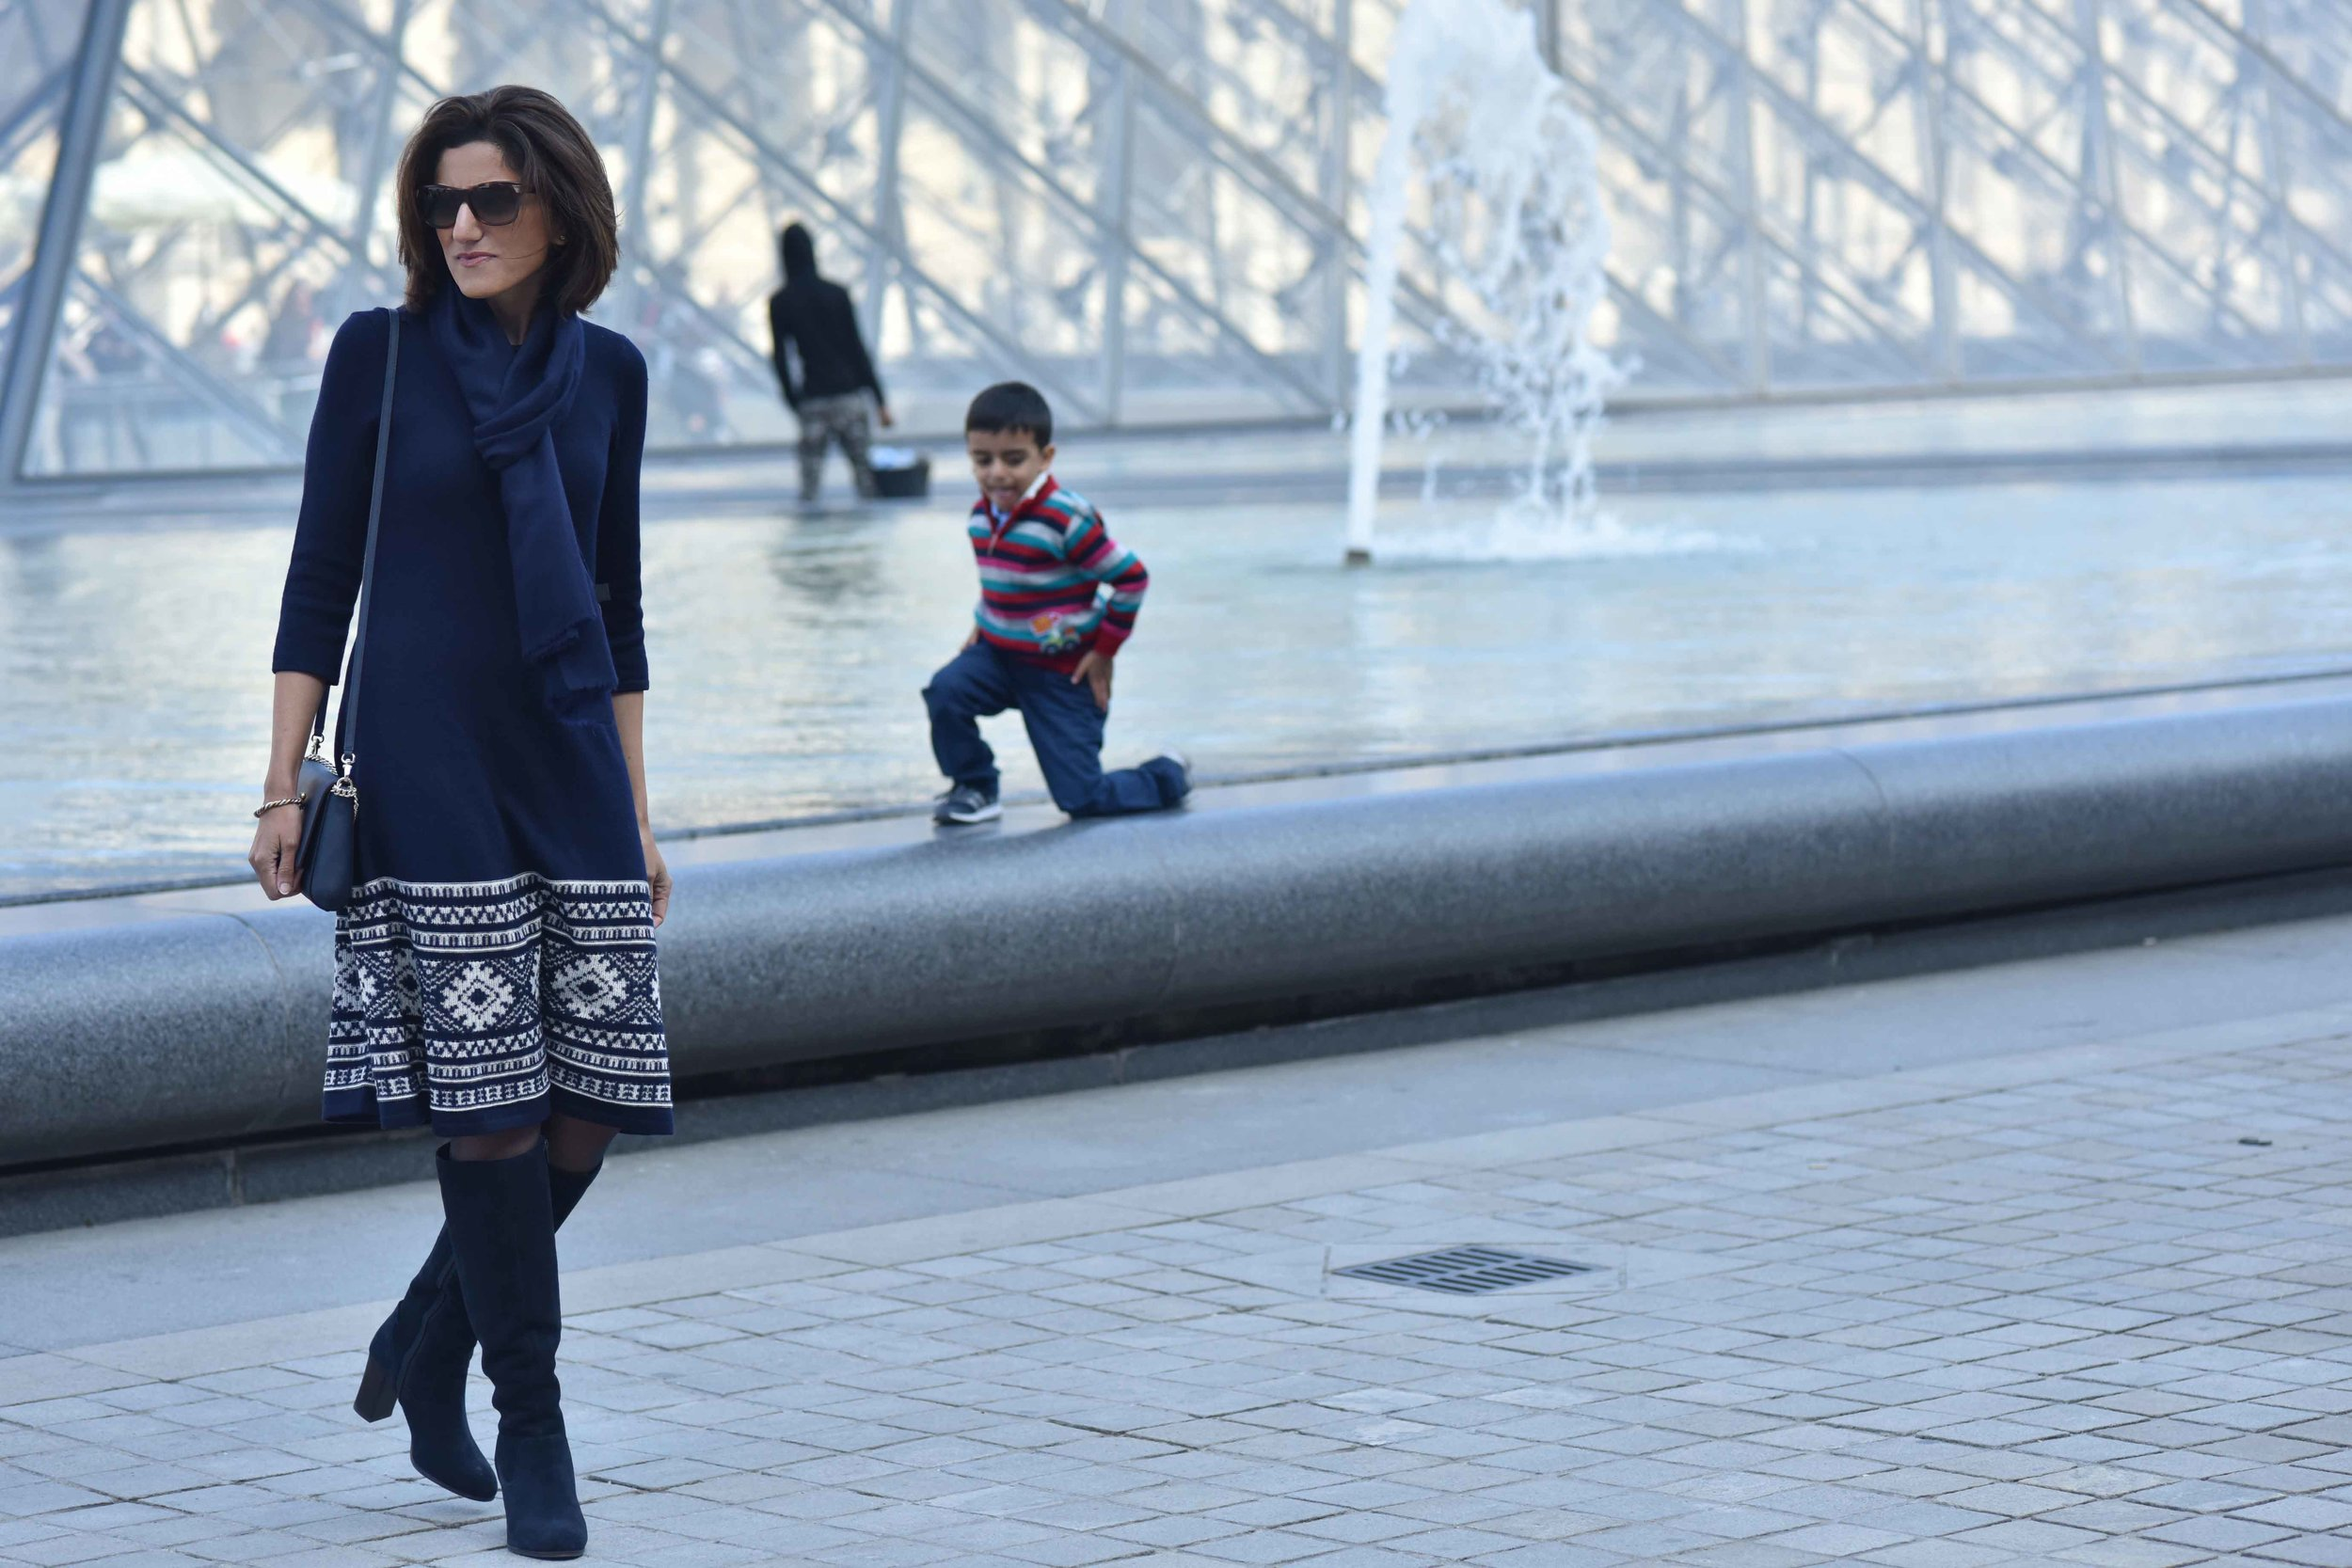 Ralph Lauren woolen jersey knit dress, Kate Spade sling bag, Marks & Spencer knee-high boots. Photo: Nina Shaw Image©sourcingstyle.com